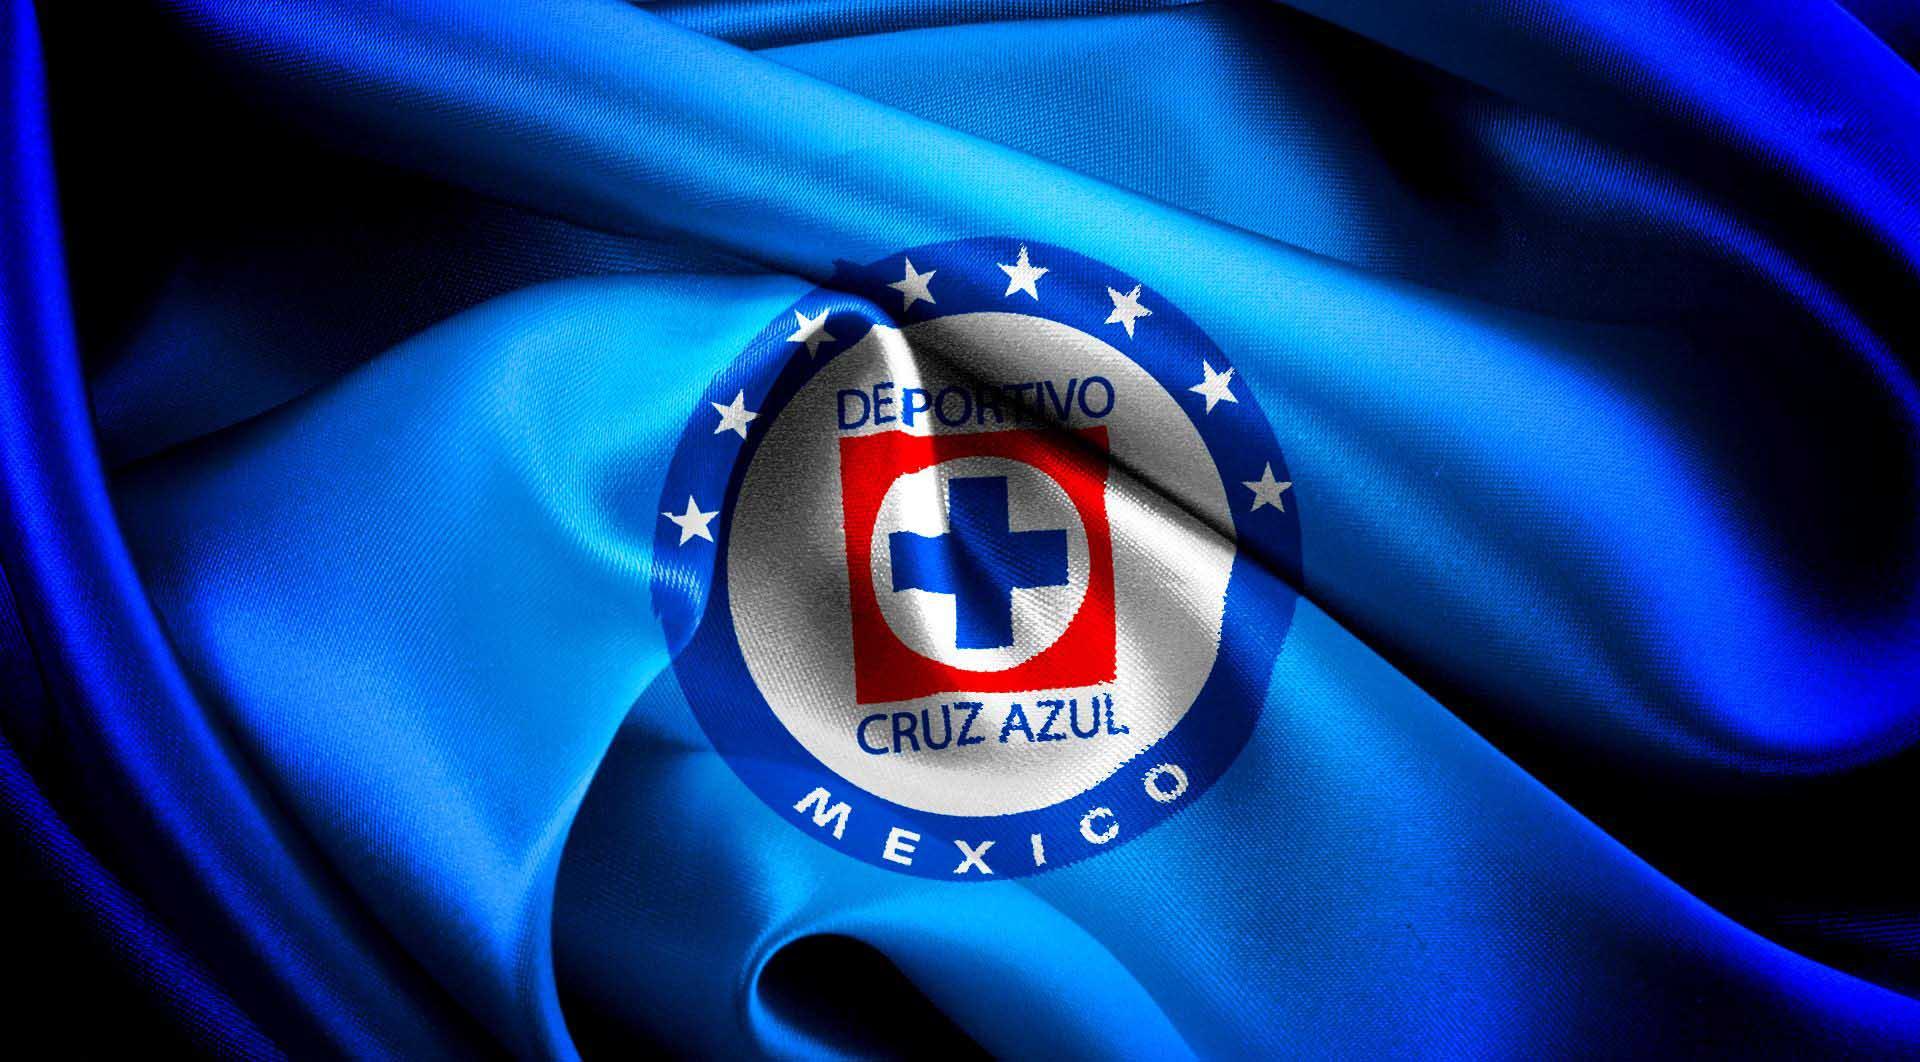 Cruz Azul Wallpaper Hd Cruz Azul Wallpapers Hd Pixelstalk Net